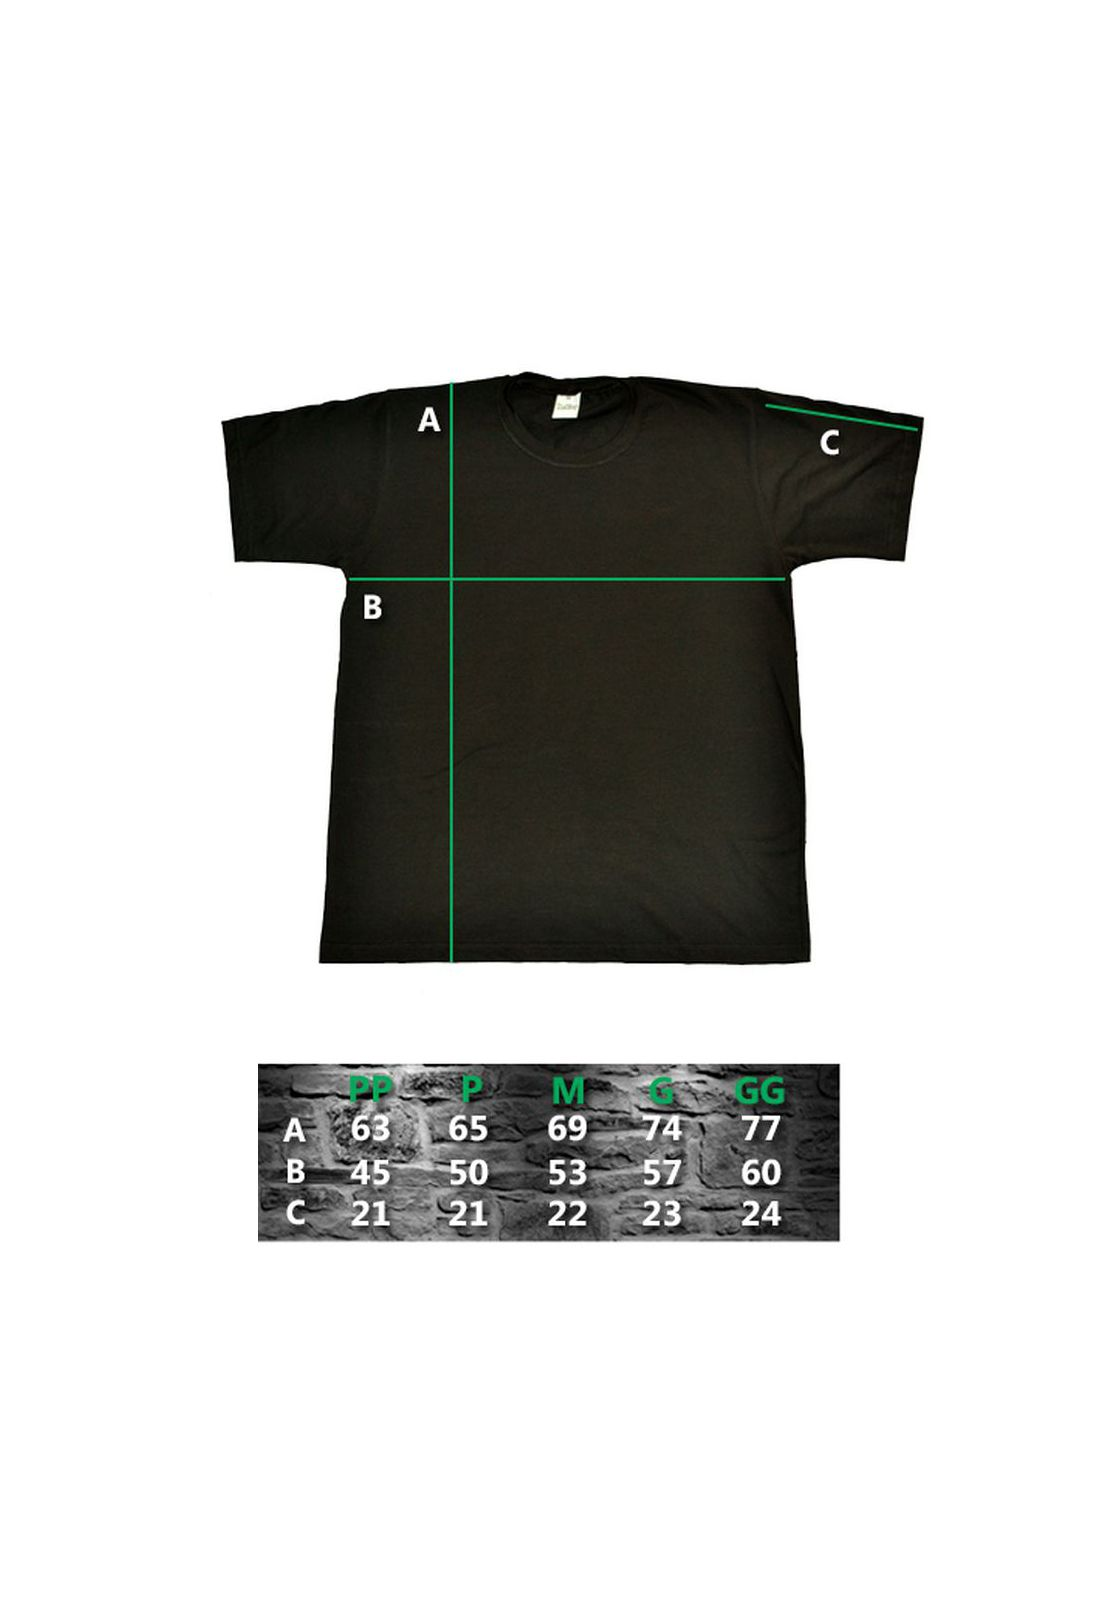 Camiseta Hooligans Soco Ingles Preto  - HShop